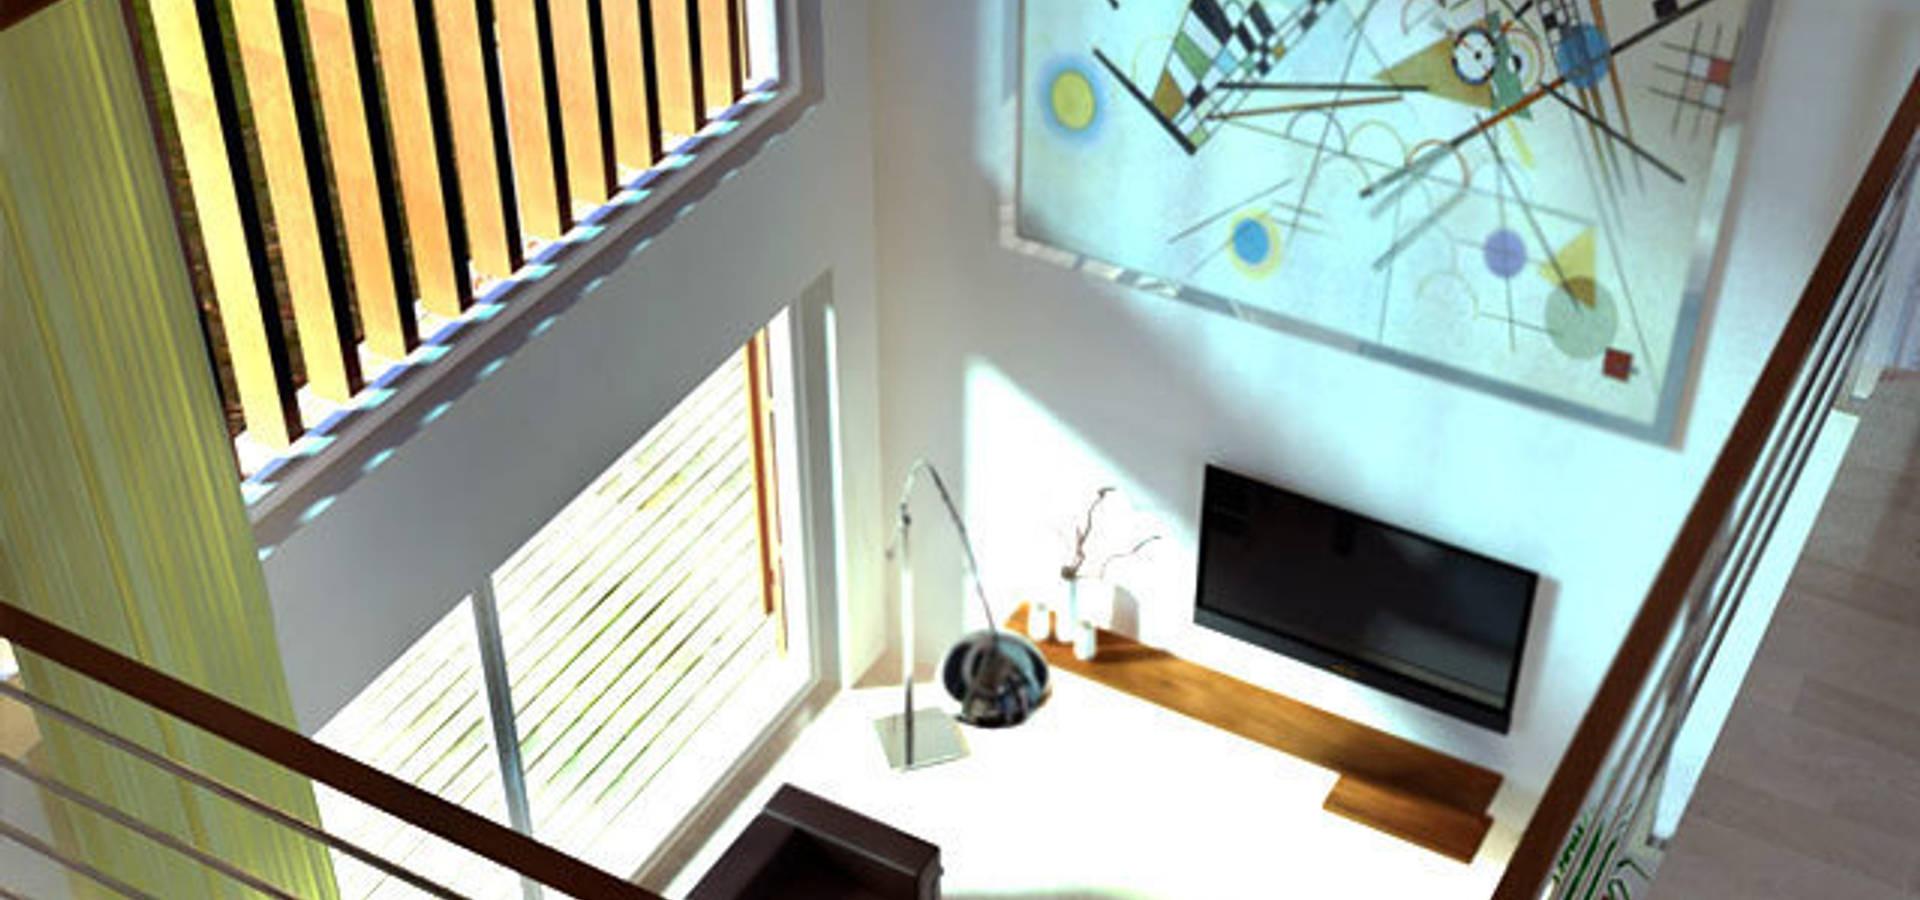 Plug in architectural Workshop